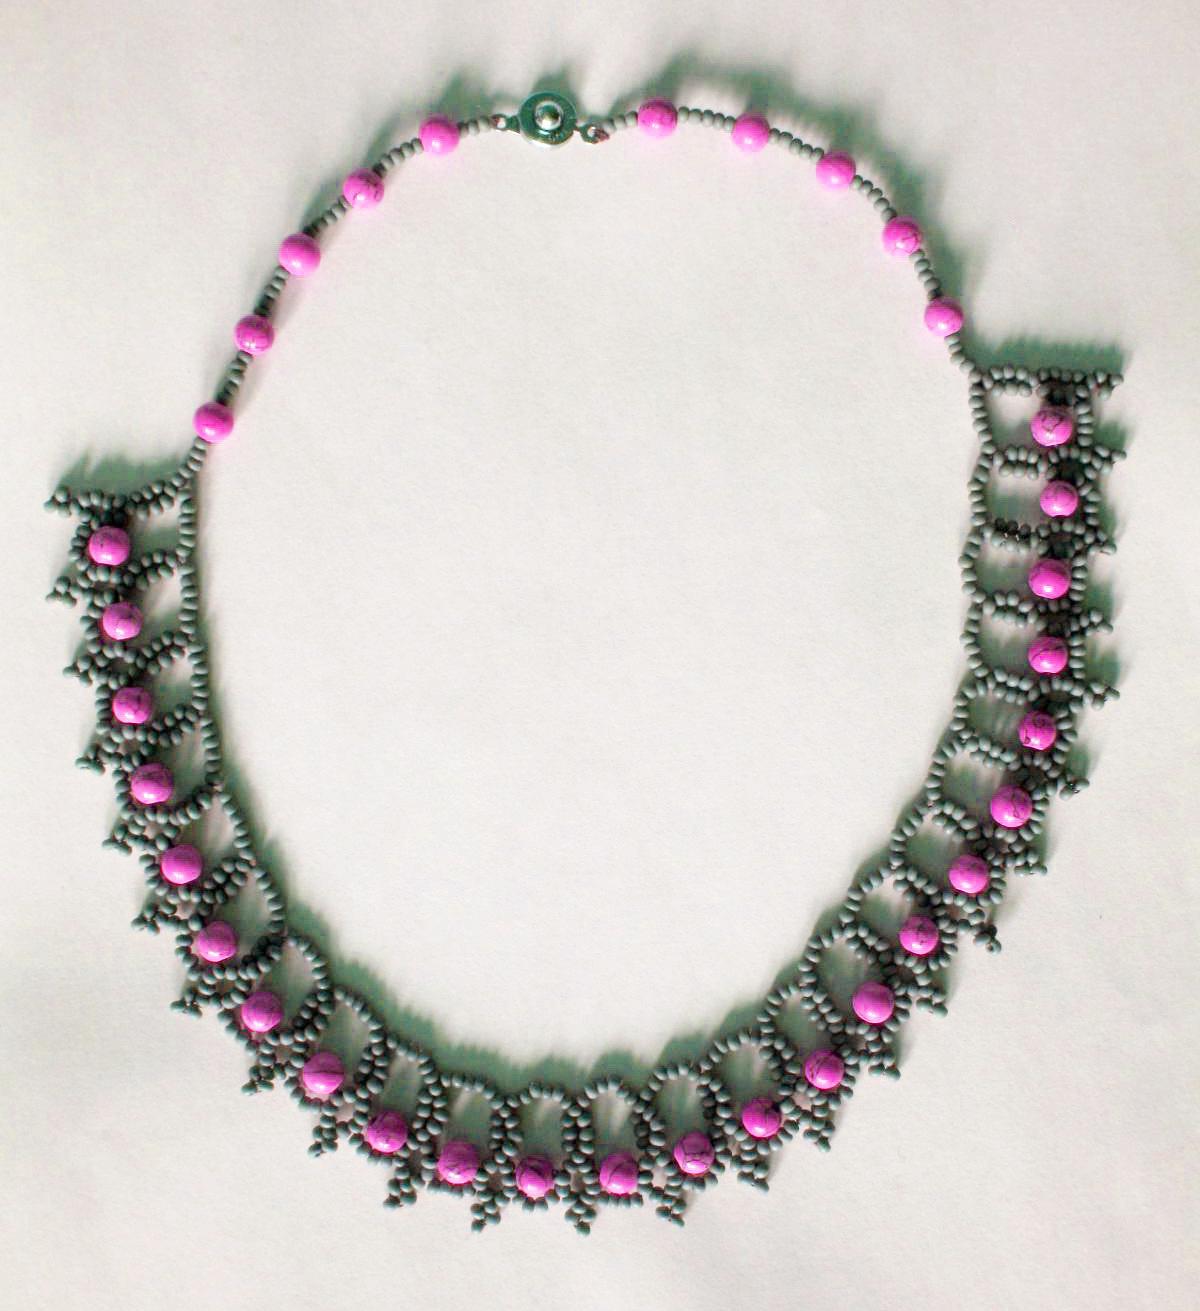 Free Seed Bead Patterns, Necklace, Monogram Coaster, Bracelet ...